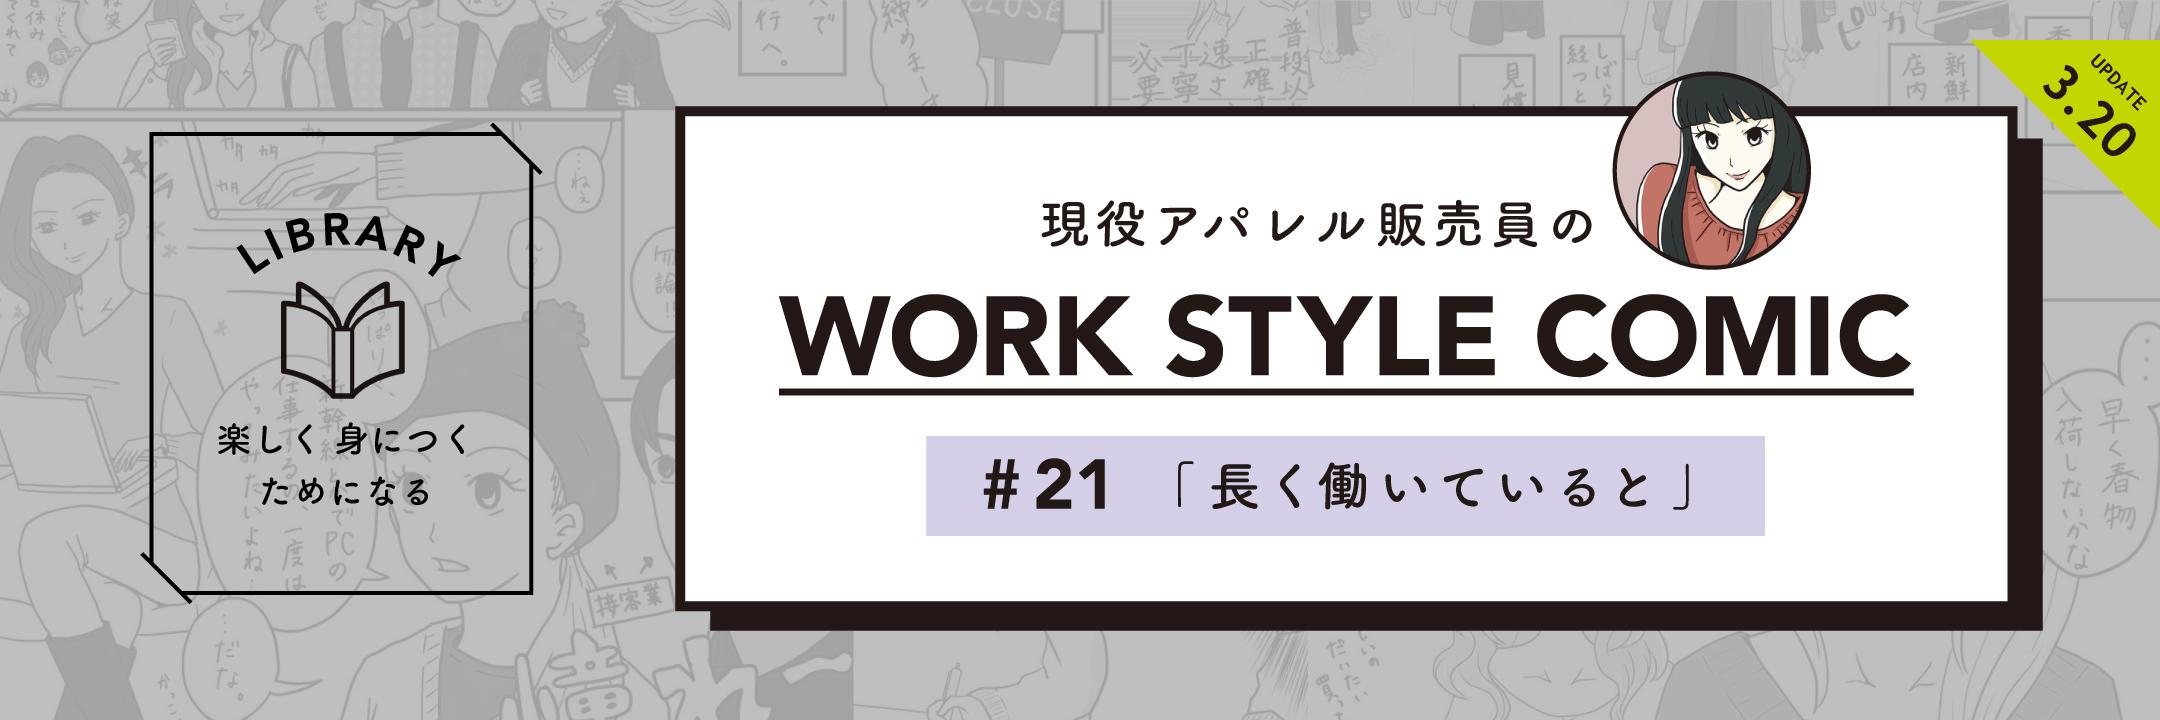 WORK STYLE COMIC21